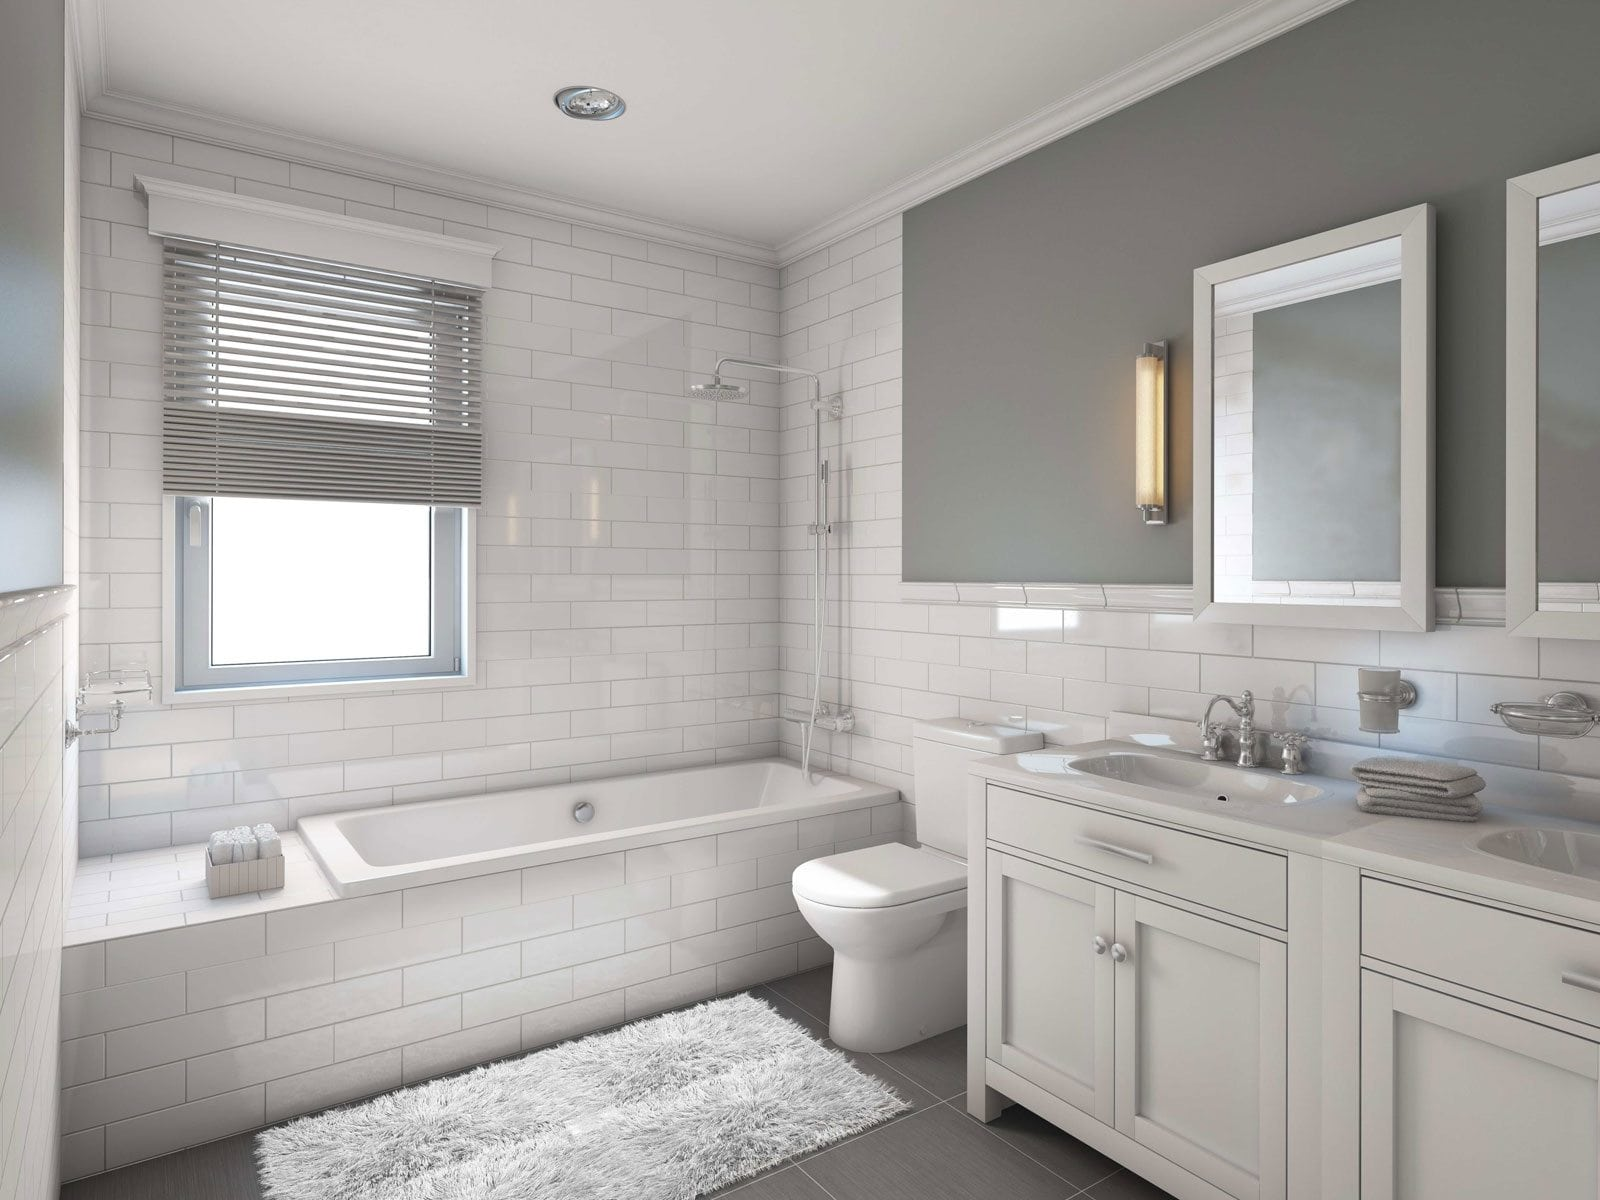 Bathroom Renovation Cost Brisbane home renovations - amazing builds